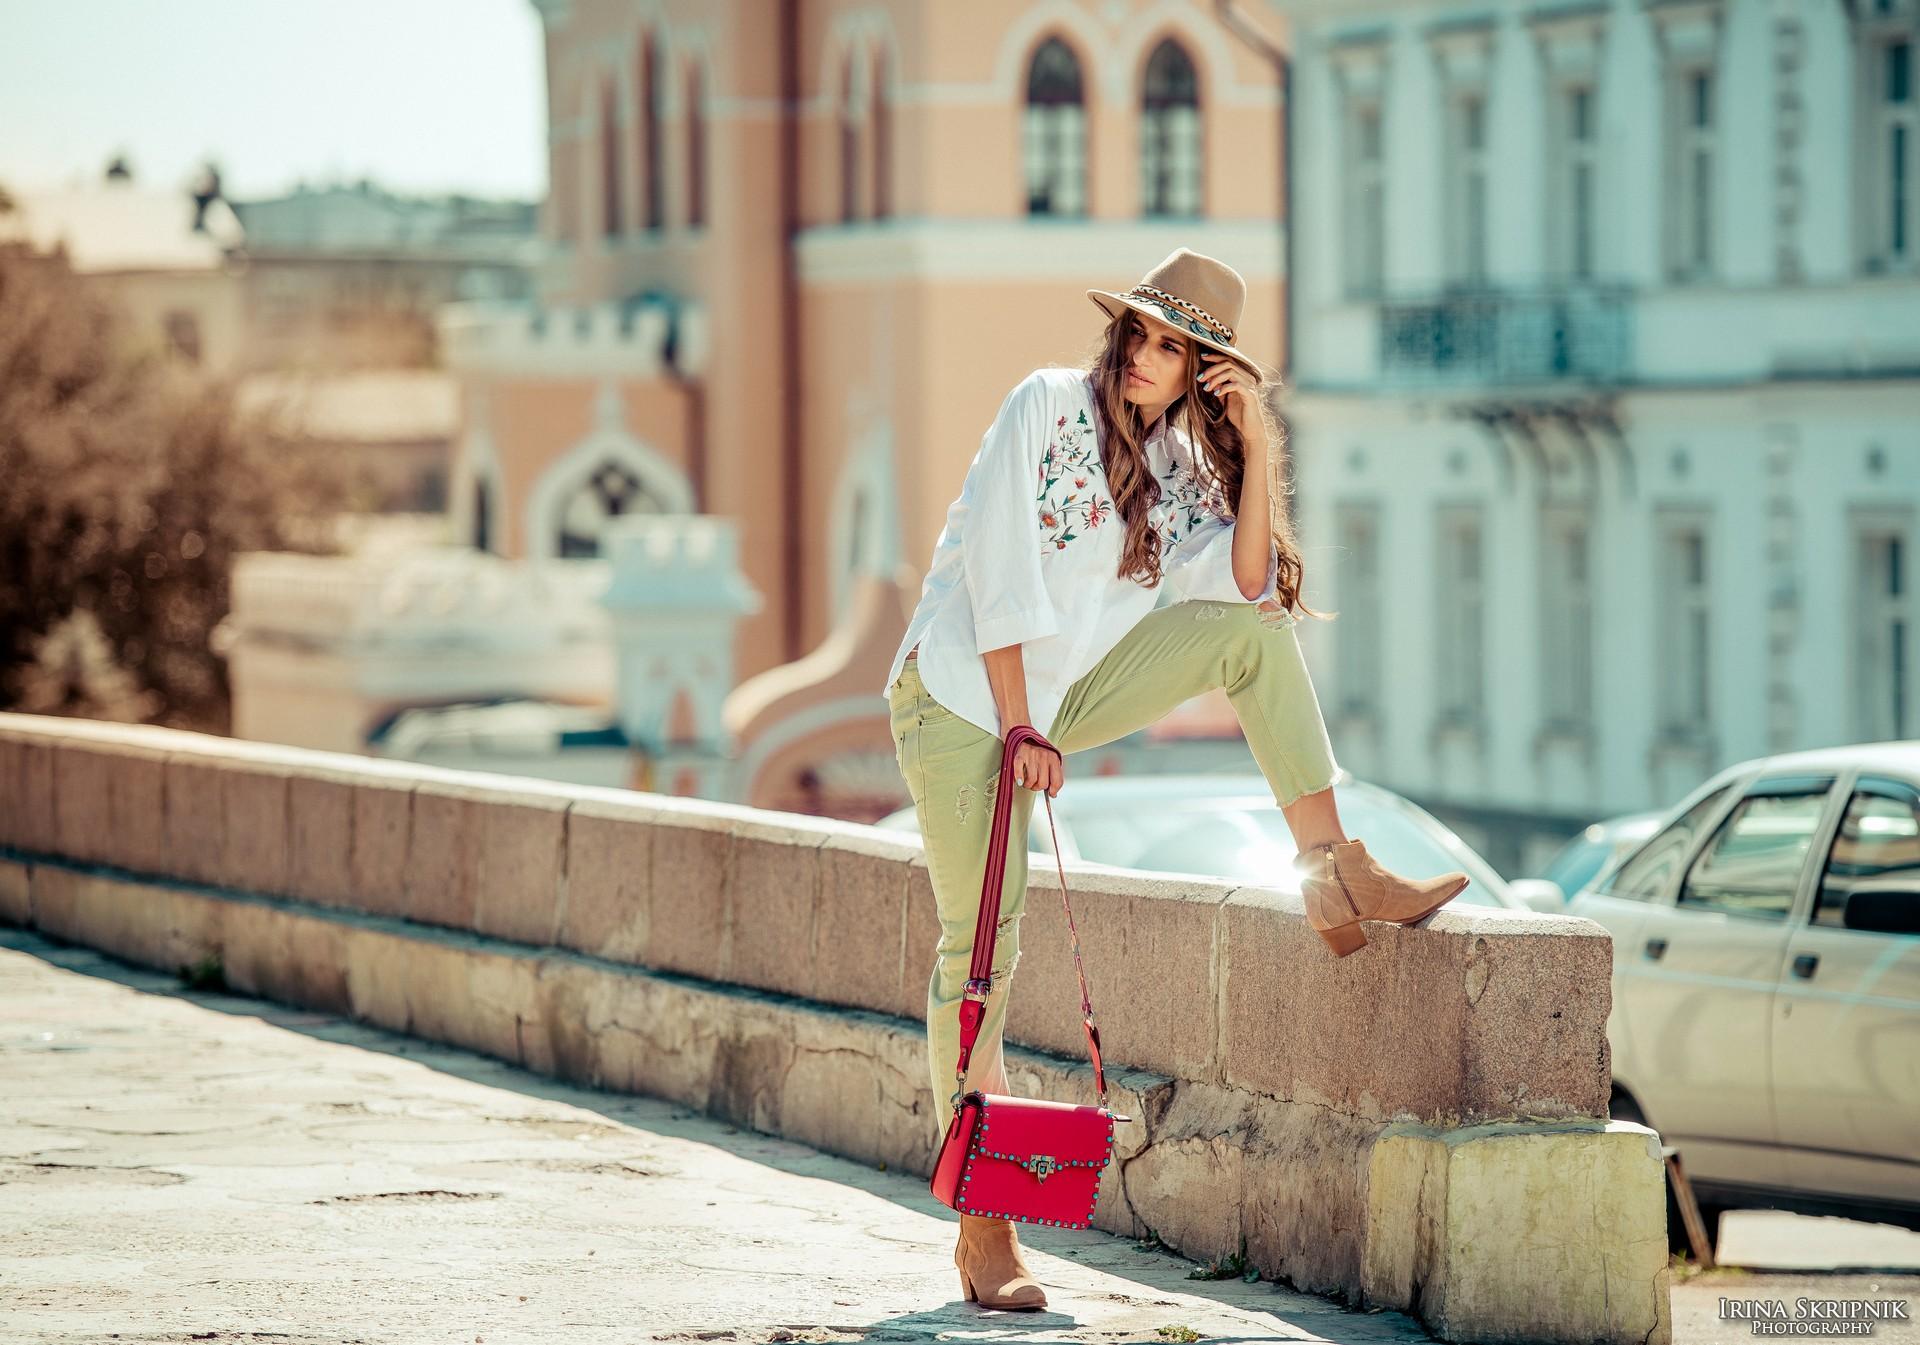 Irina Skripnik Photography 30065